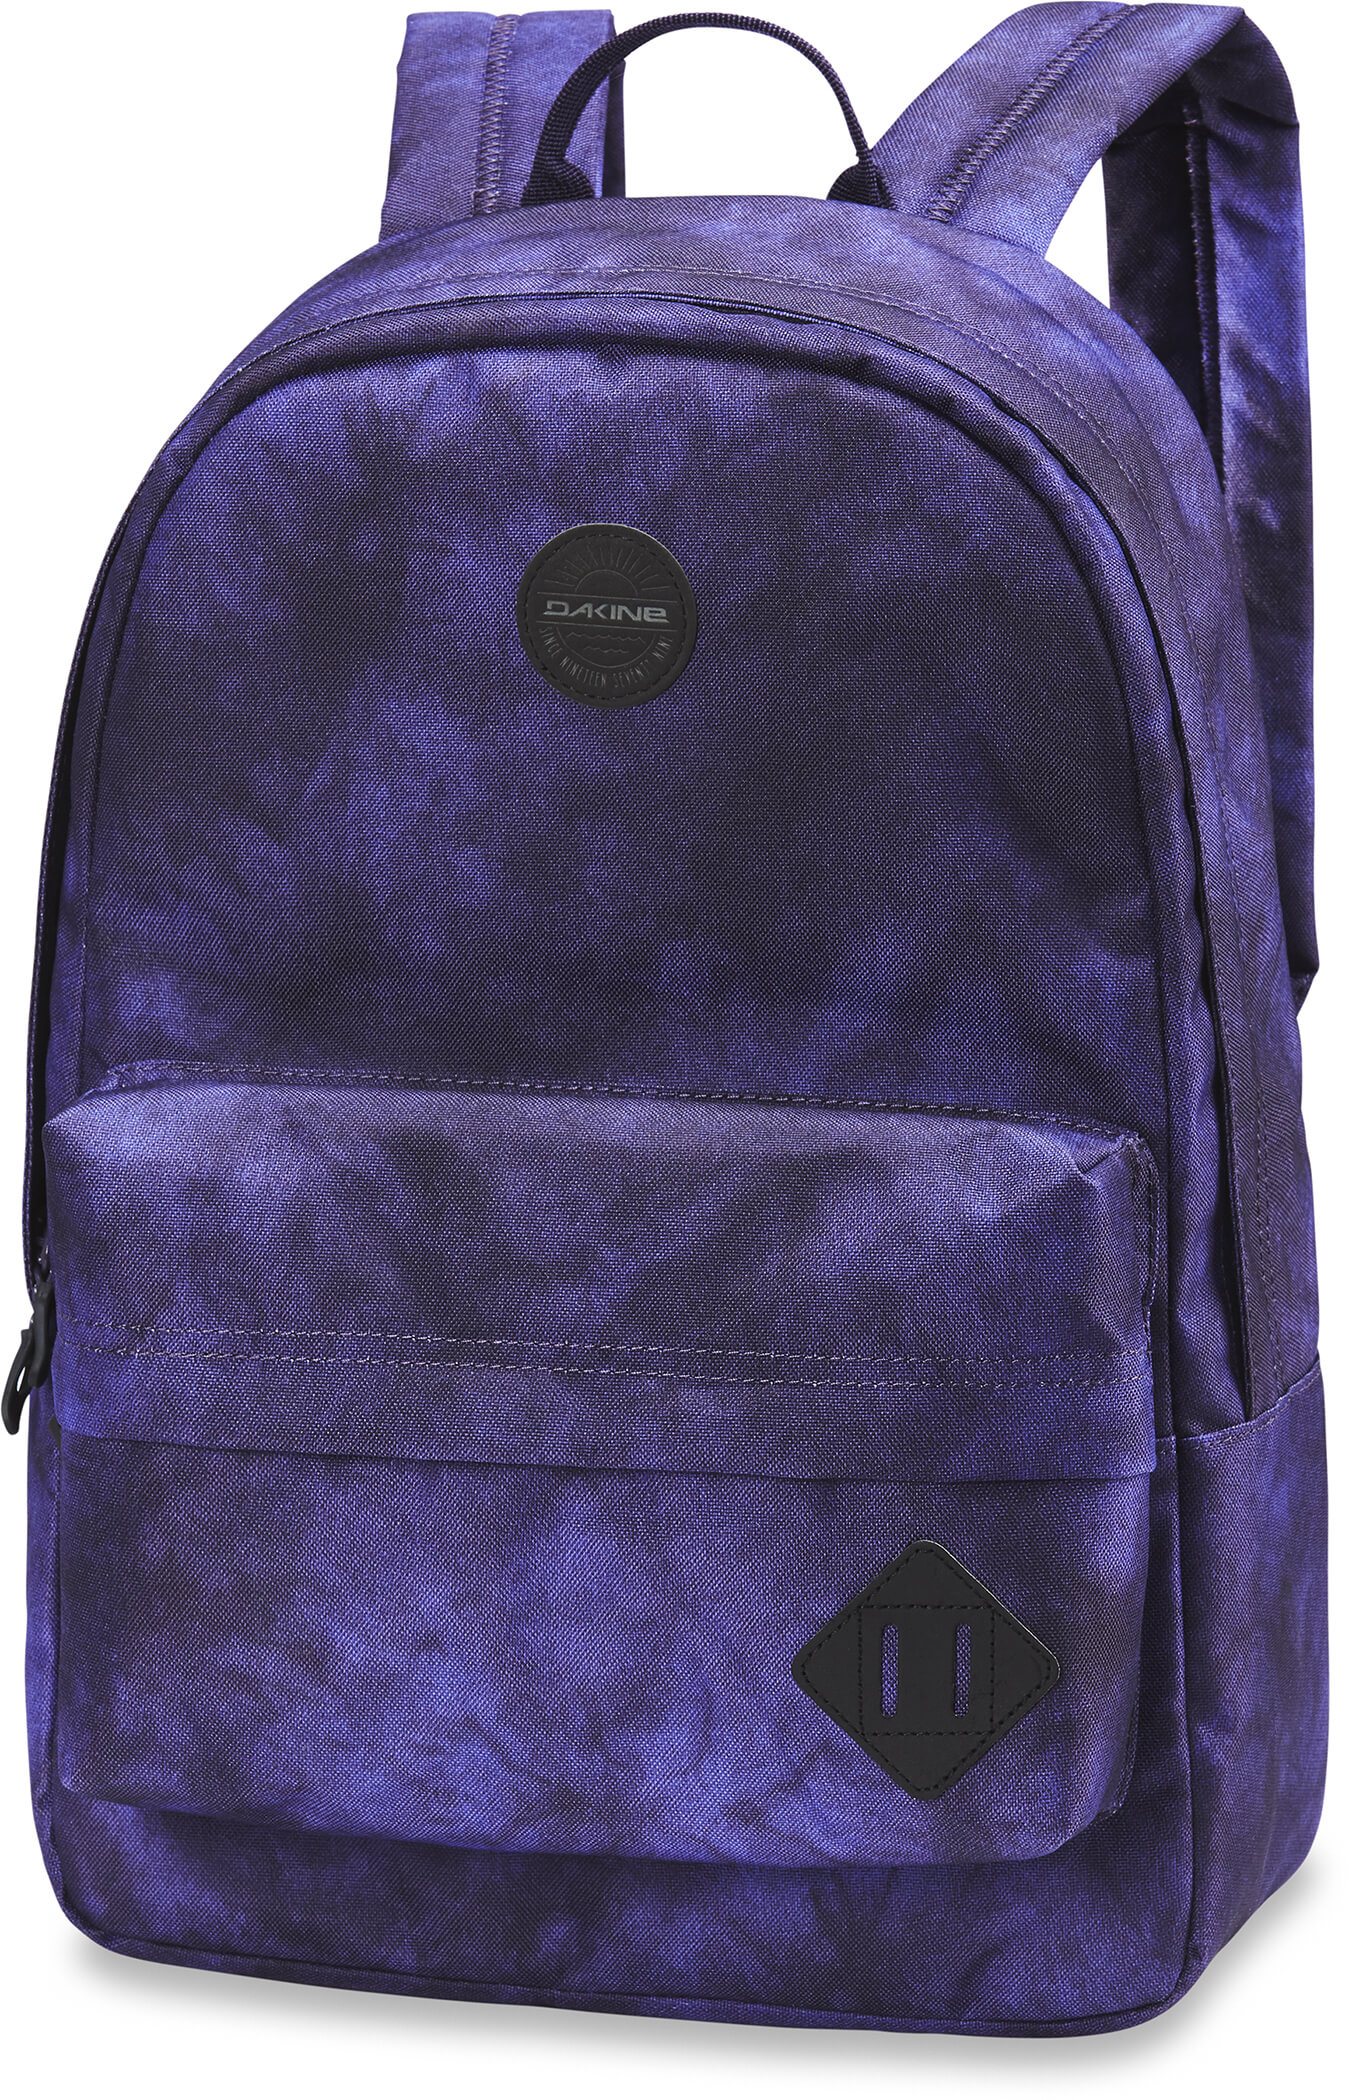 900519eb55b Dakine Batoh 365 Pack 21L Purple Haze 8130085-S18 Doprava ZDARMA ...